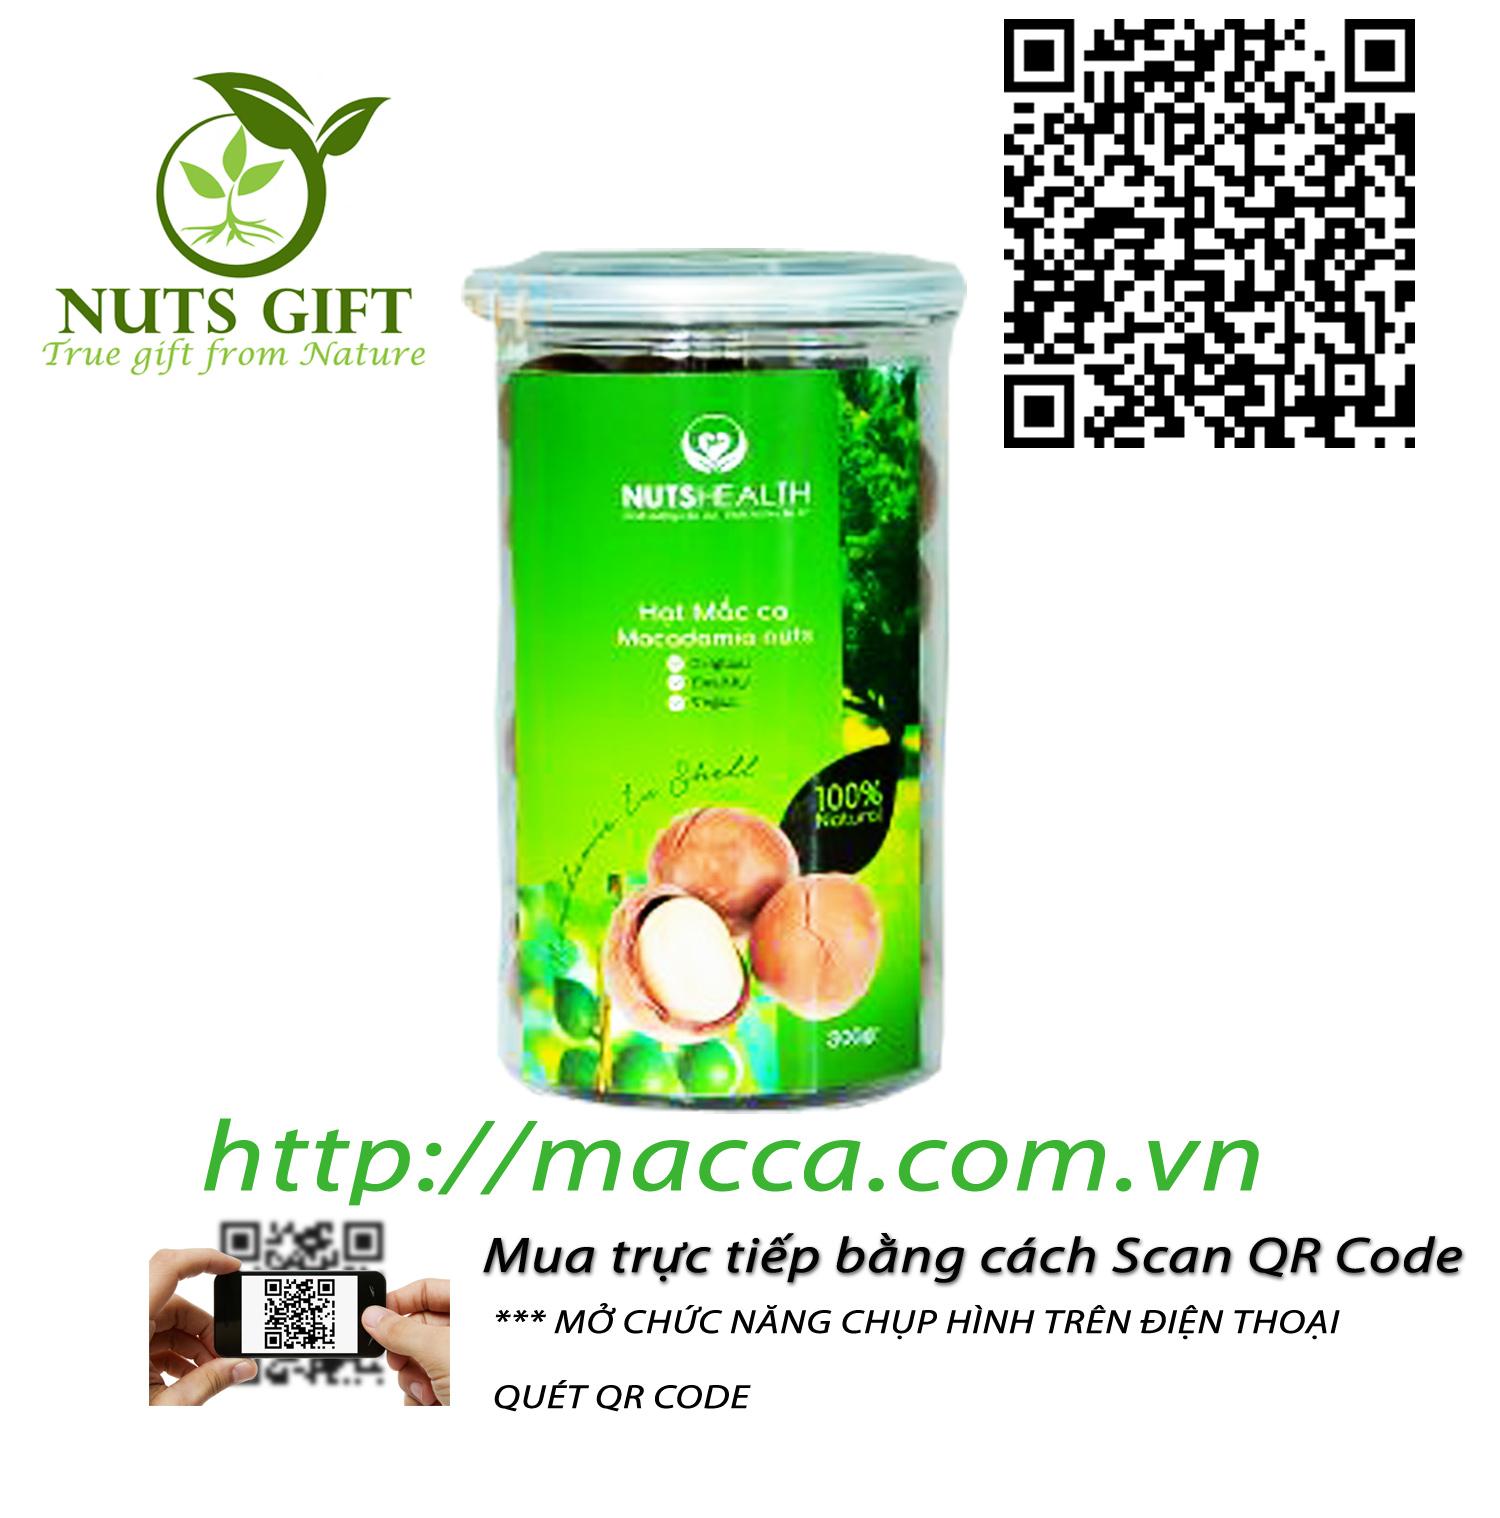 HẠT MACCA ÚC – NUTSHEALTH – 300 GR